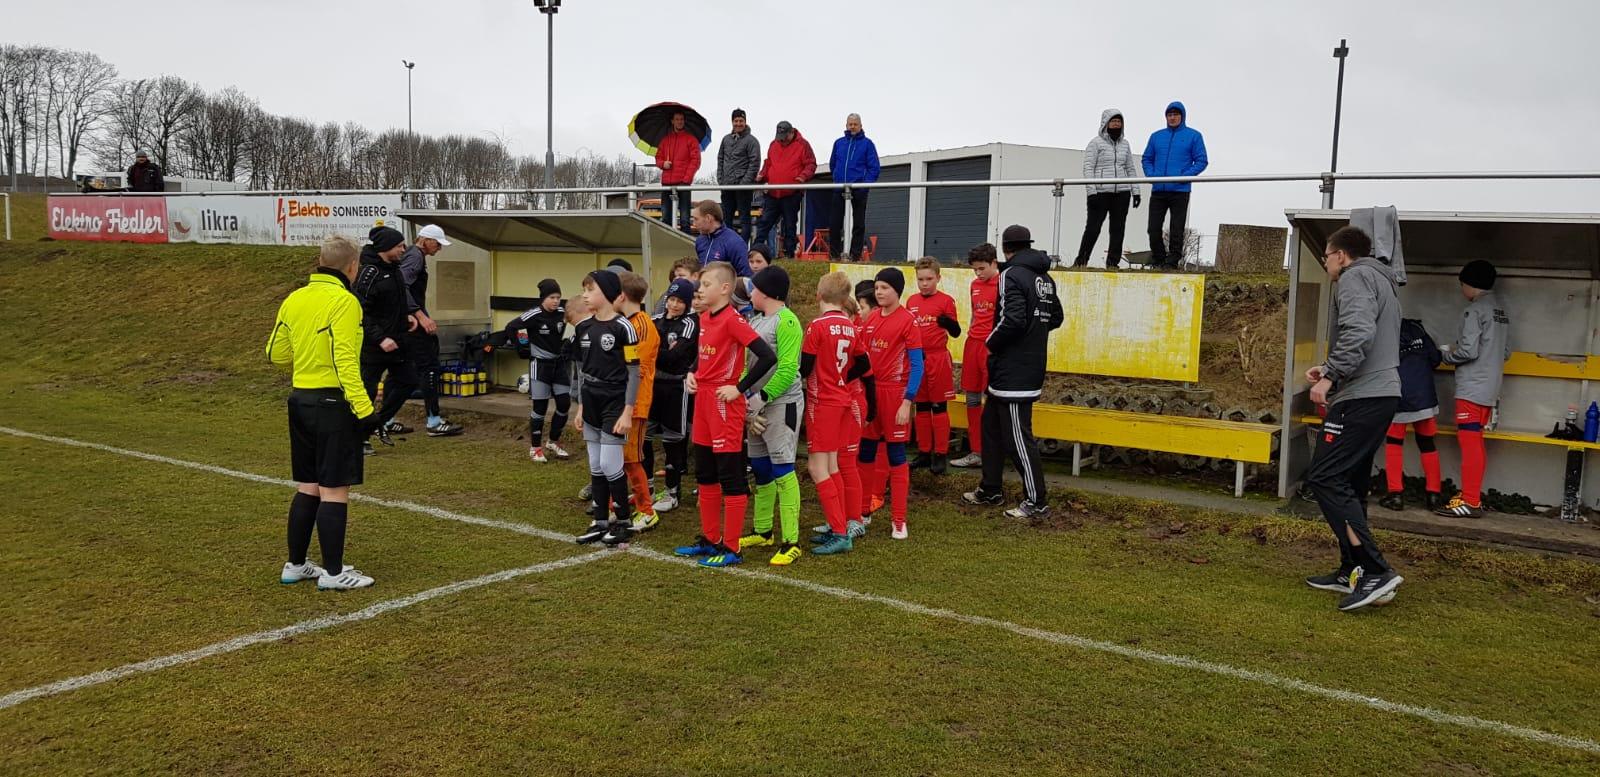 D-Junioren Auswärtsspiel Sonneberg